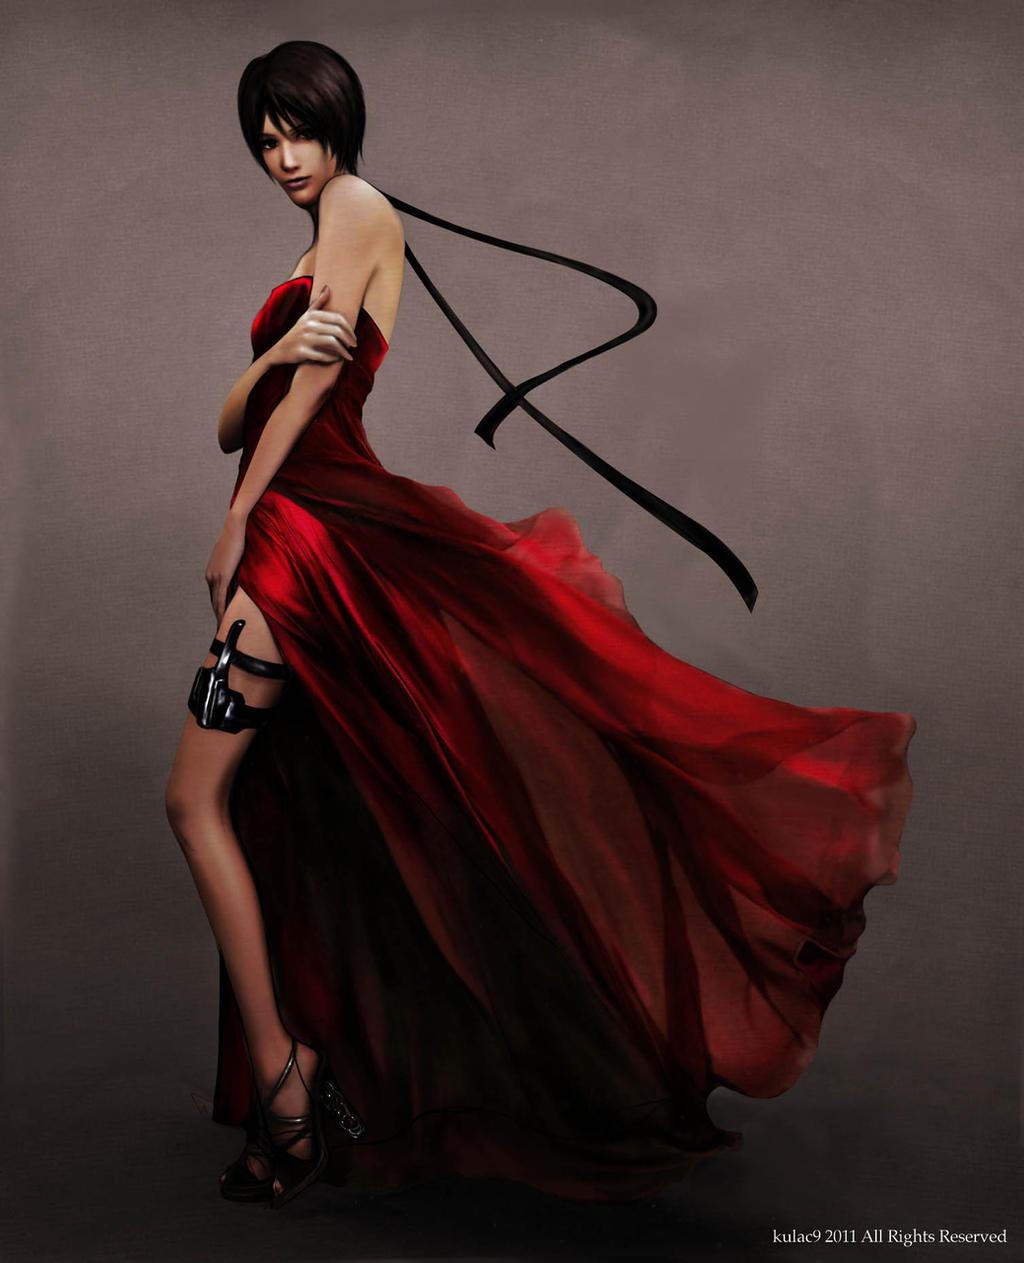 Ada Wong - Resident Evil 4 by Kunoichi1111